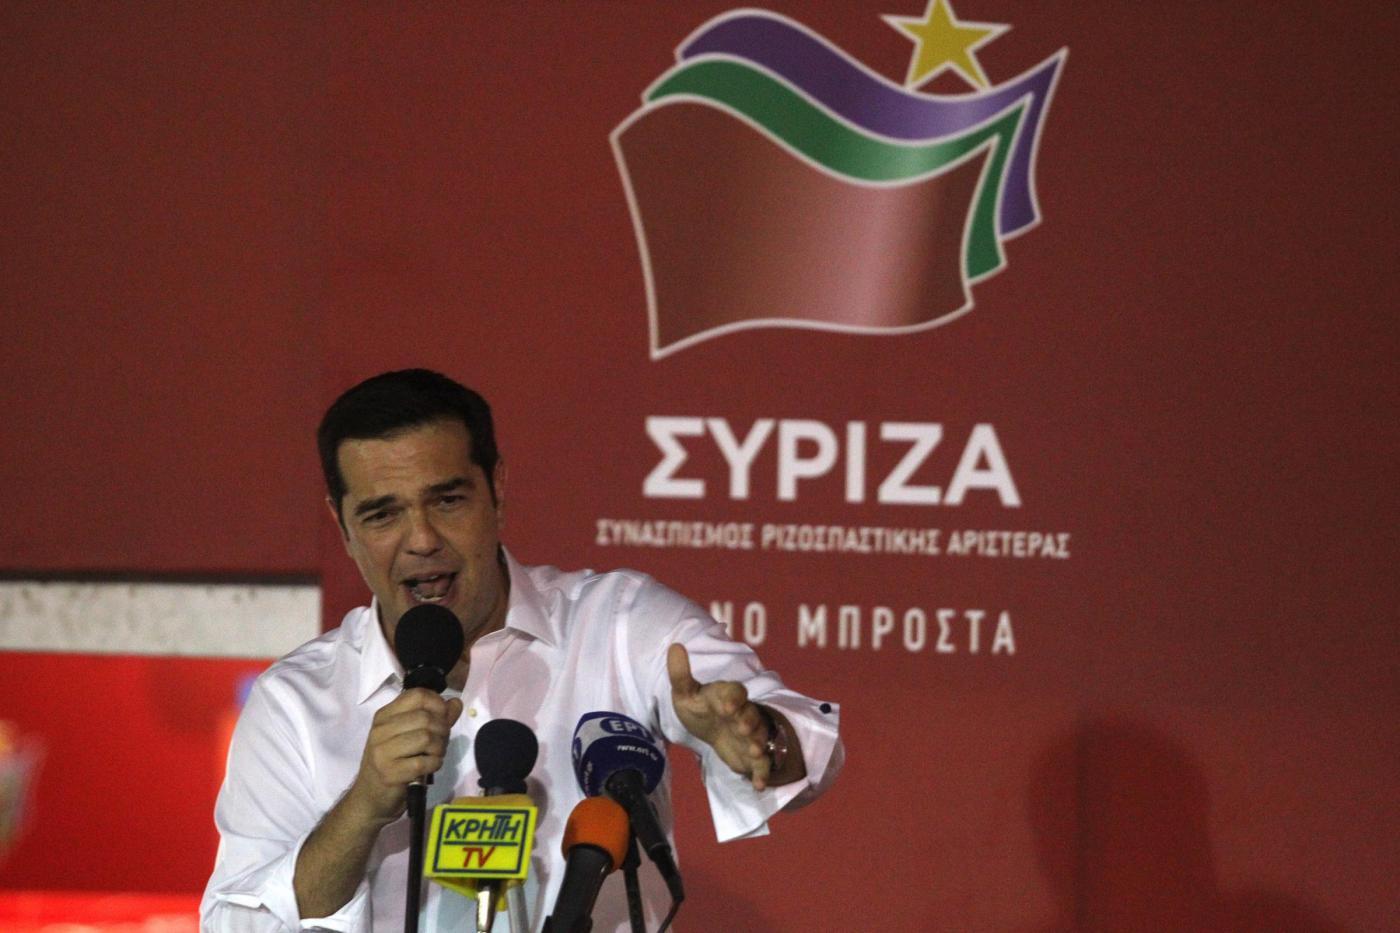 Syriza 150x150